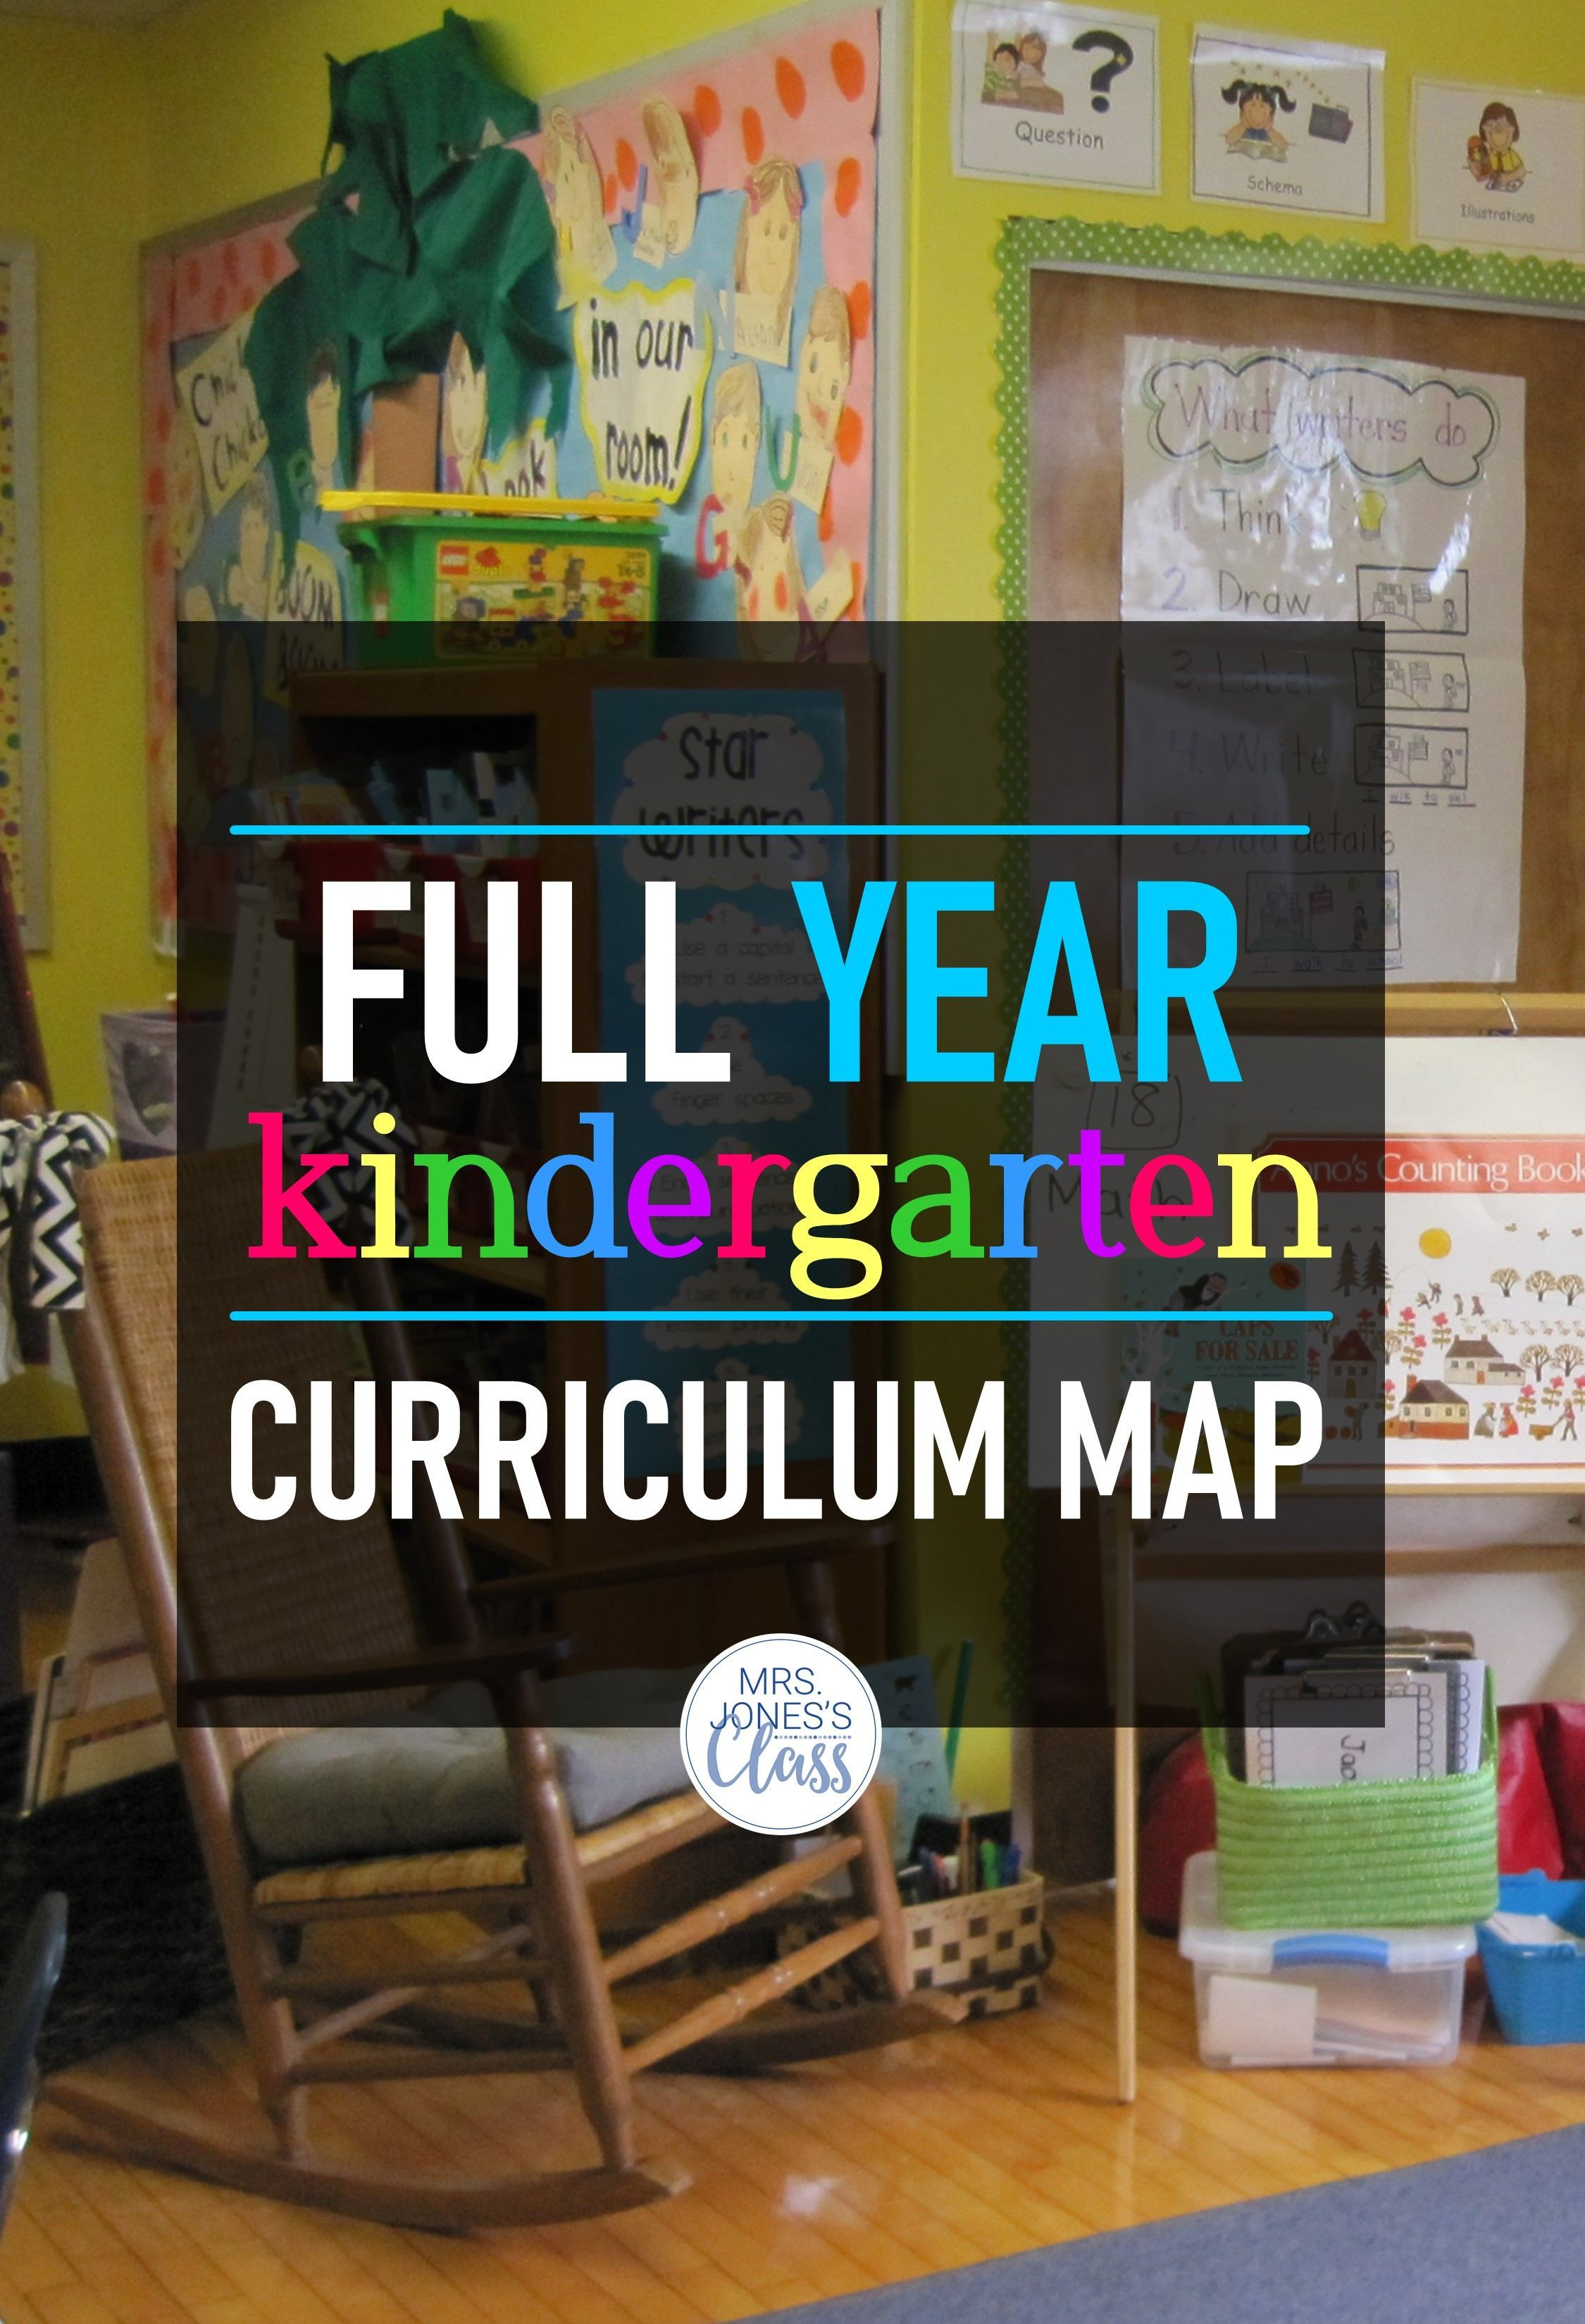 Full Year Kindergarten Curriculum Map In